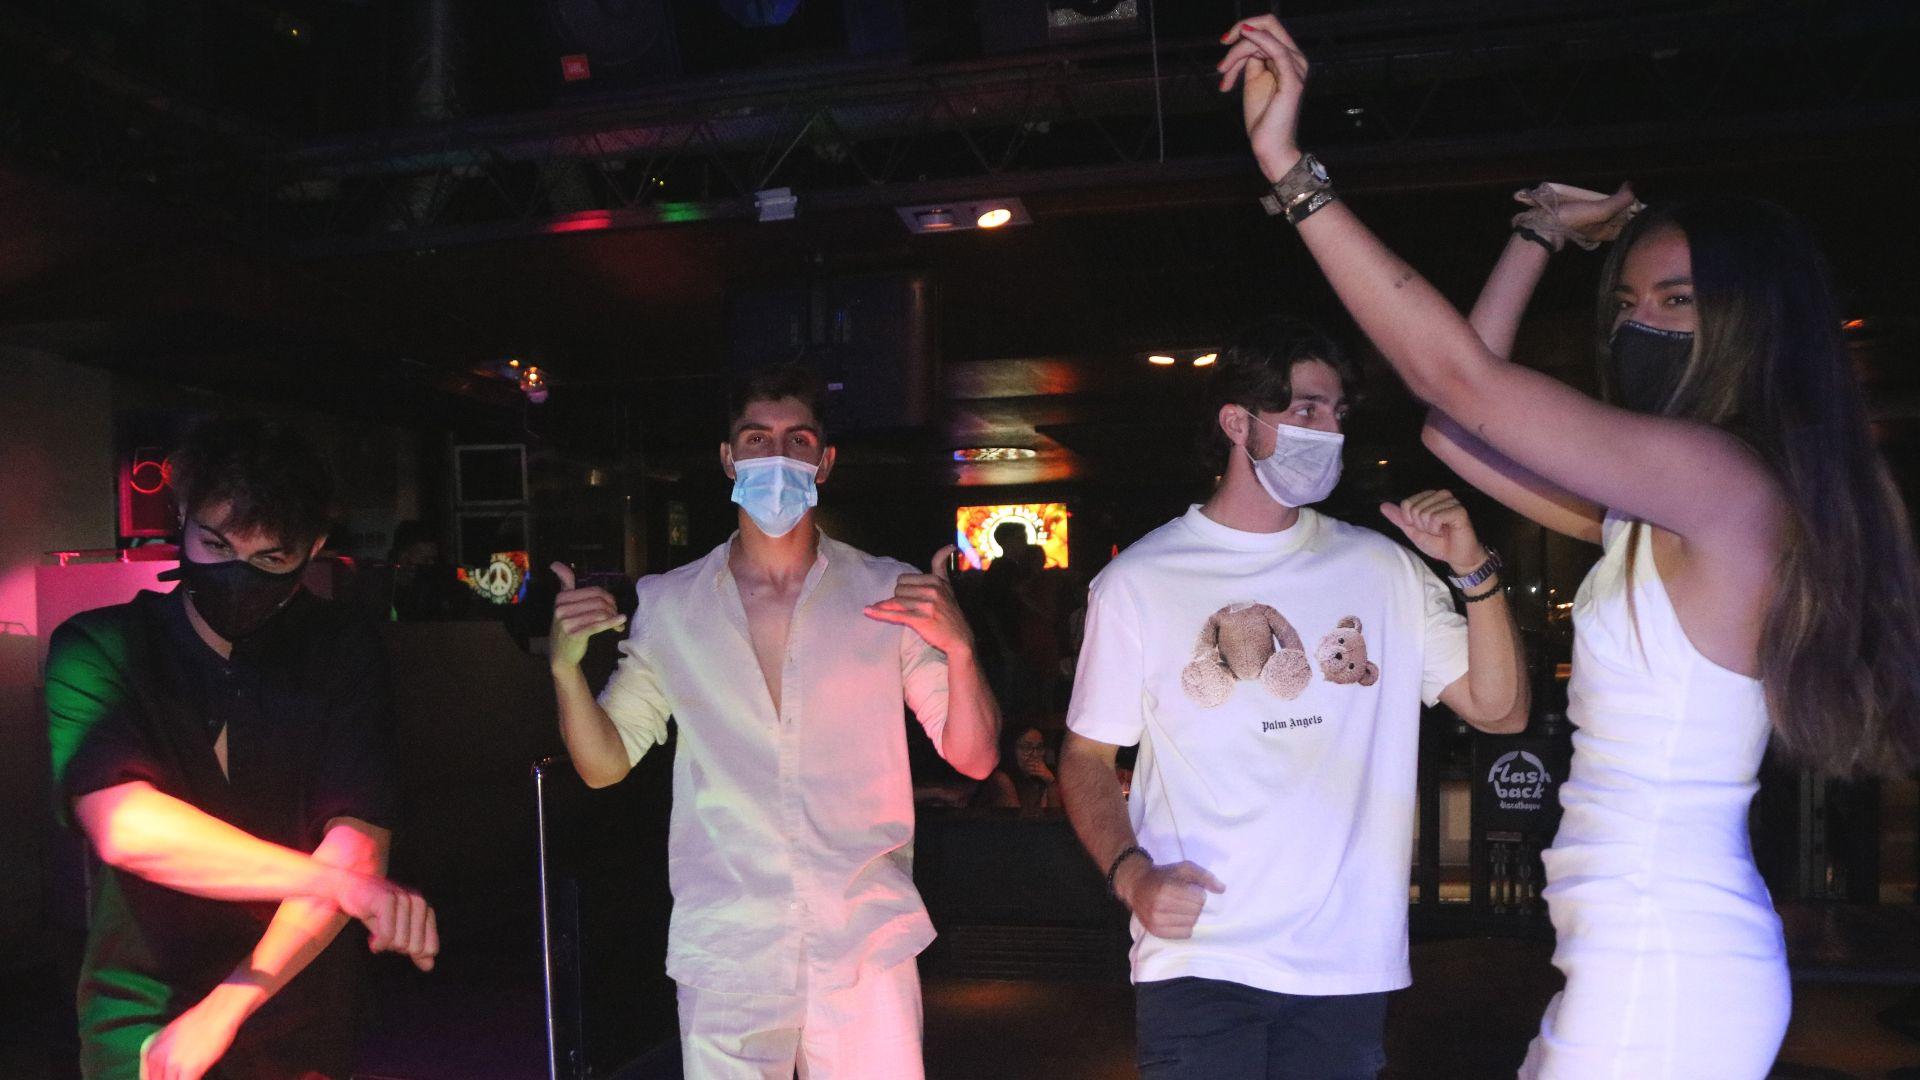 joves ballant discoteca